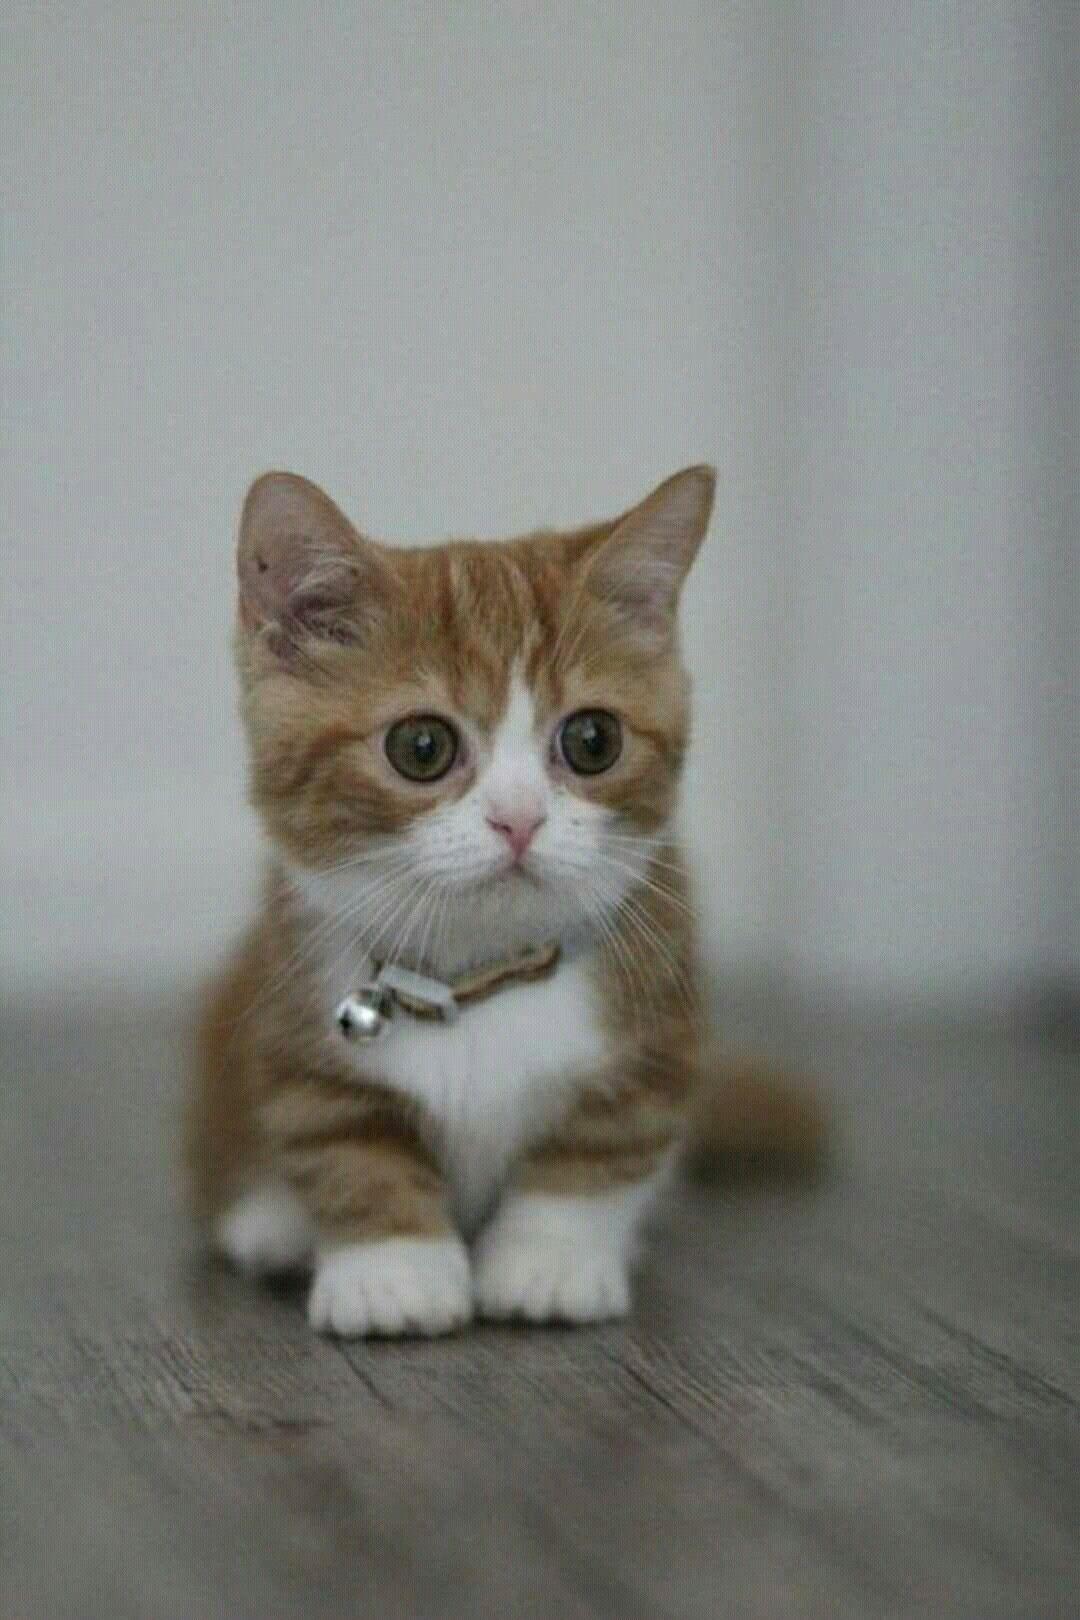 catsandkittensbreeds Kittens Kittens cutest, Cute